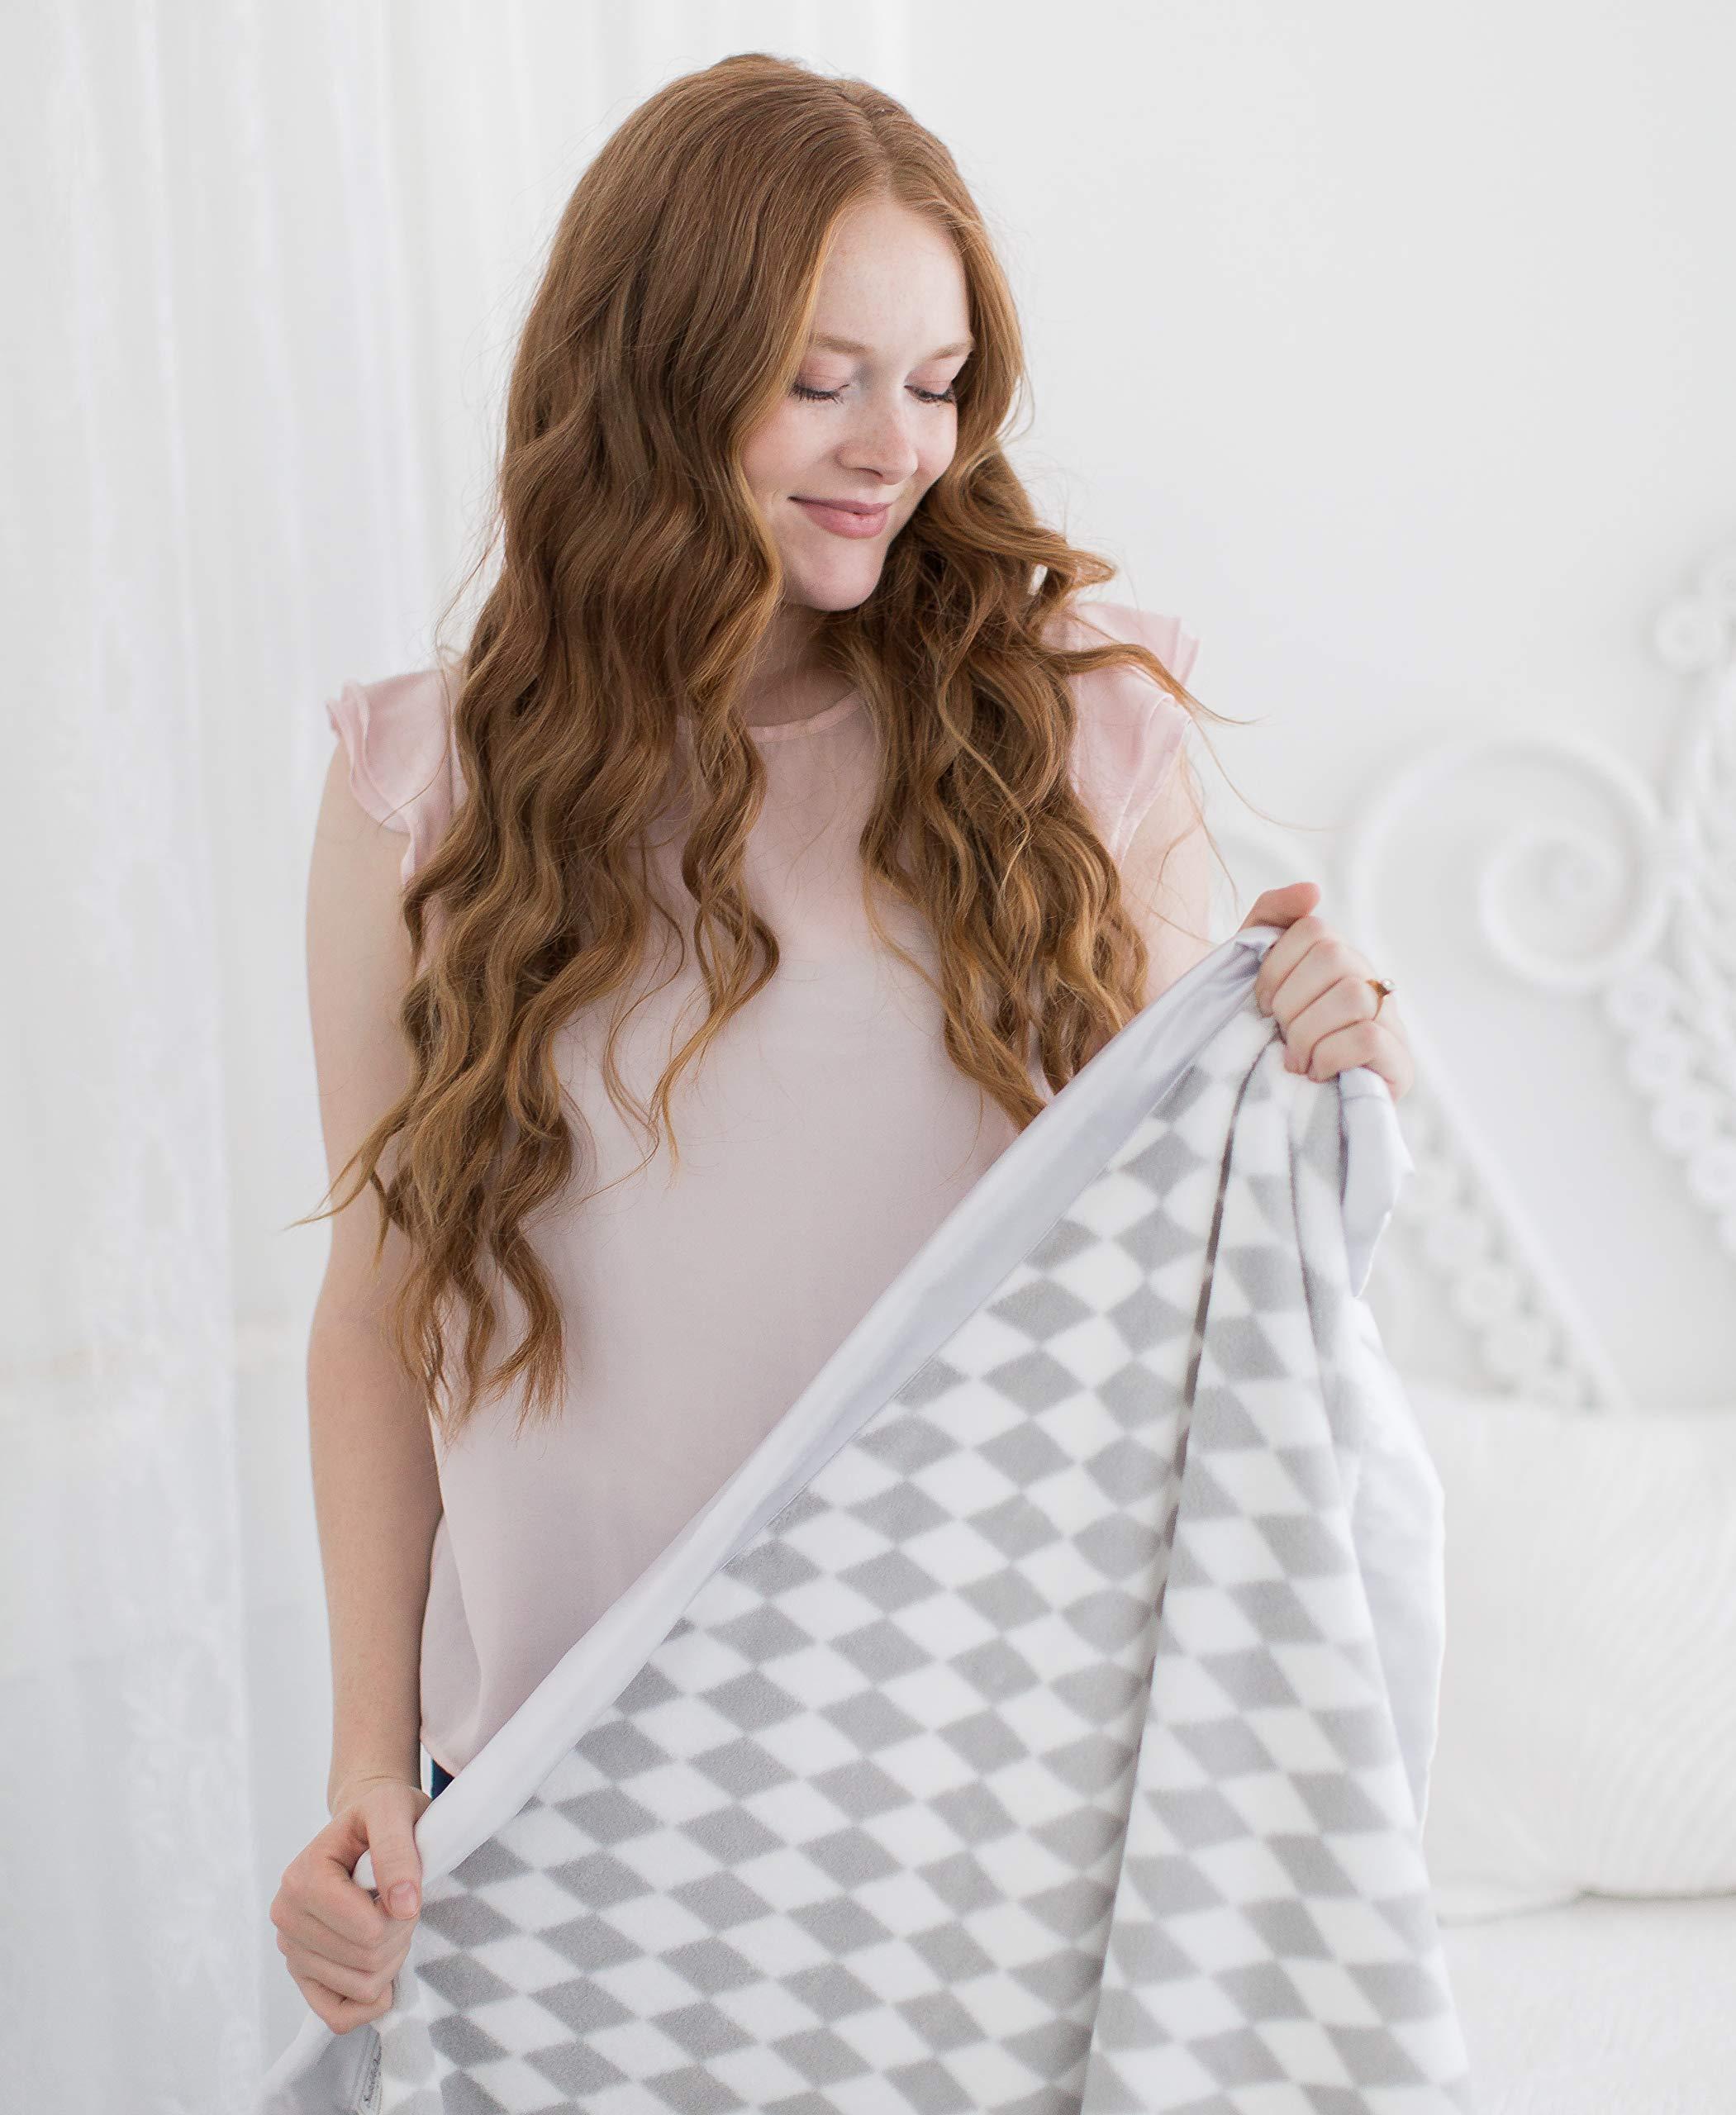 SwaddleDesigns Stroller Blanket, Forever Diamonds with Sterling Satin Trim